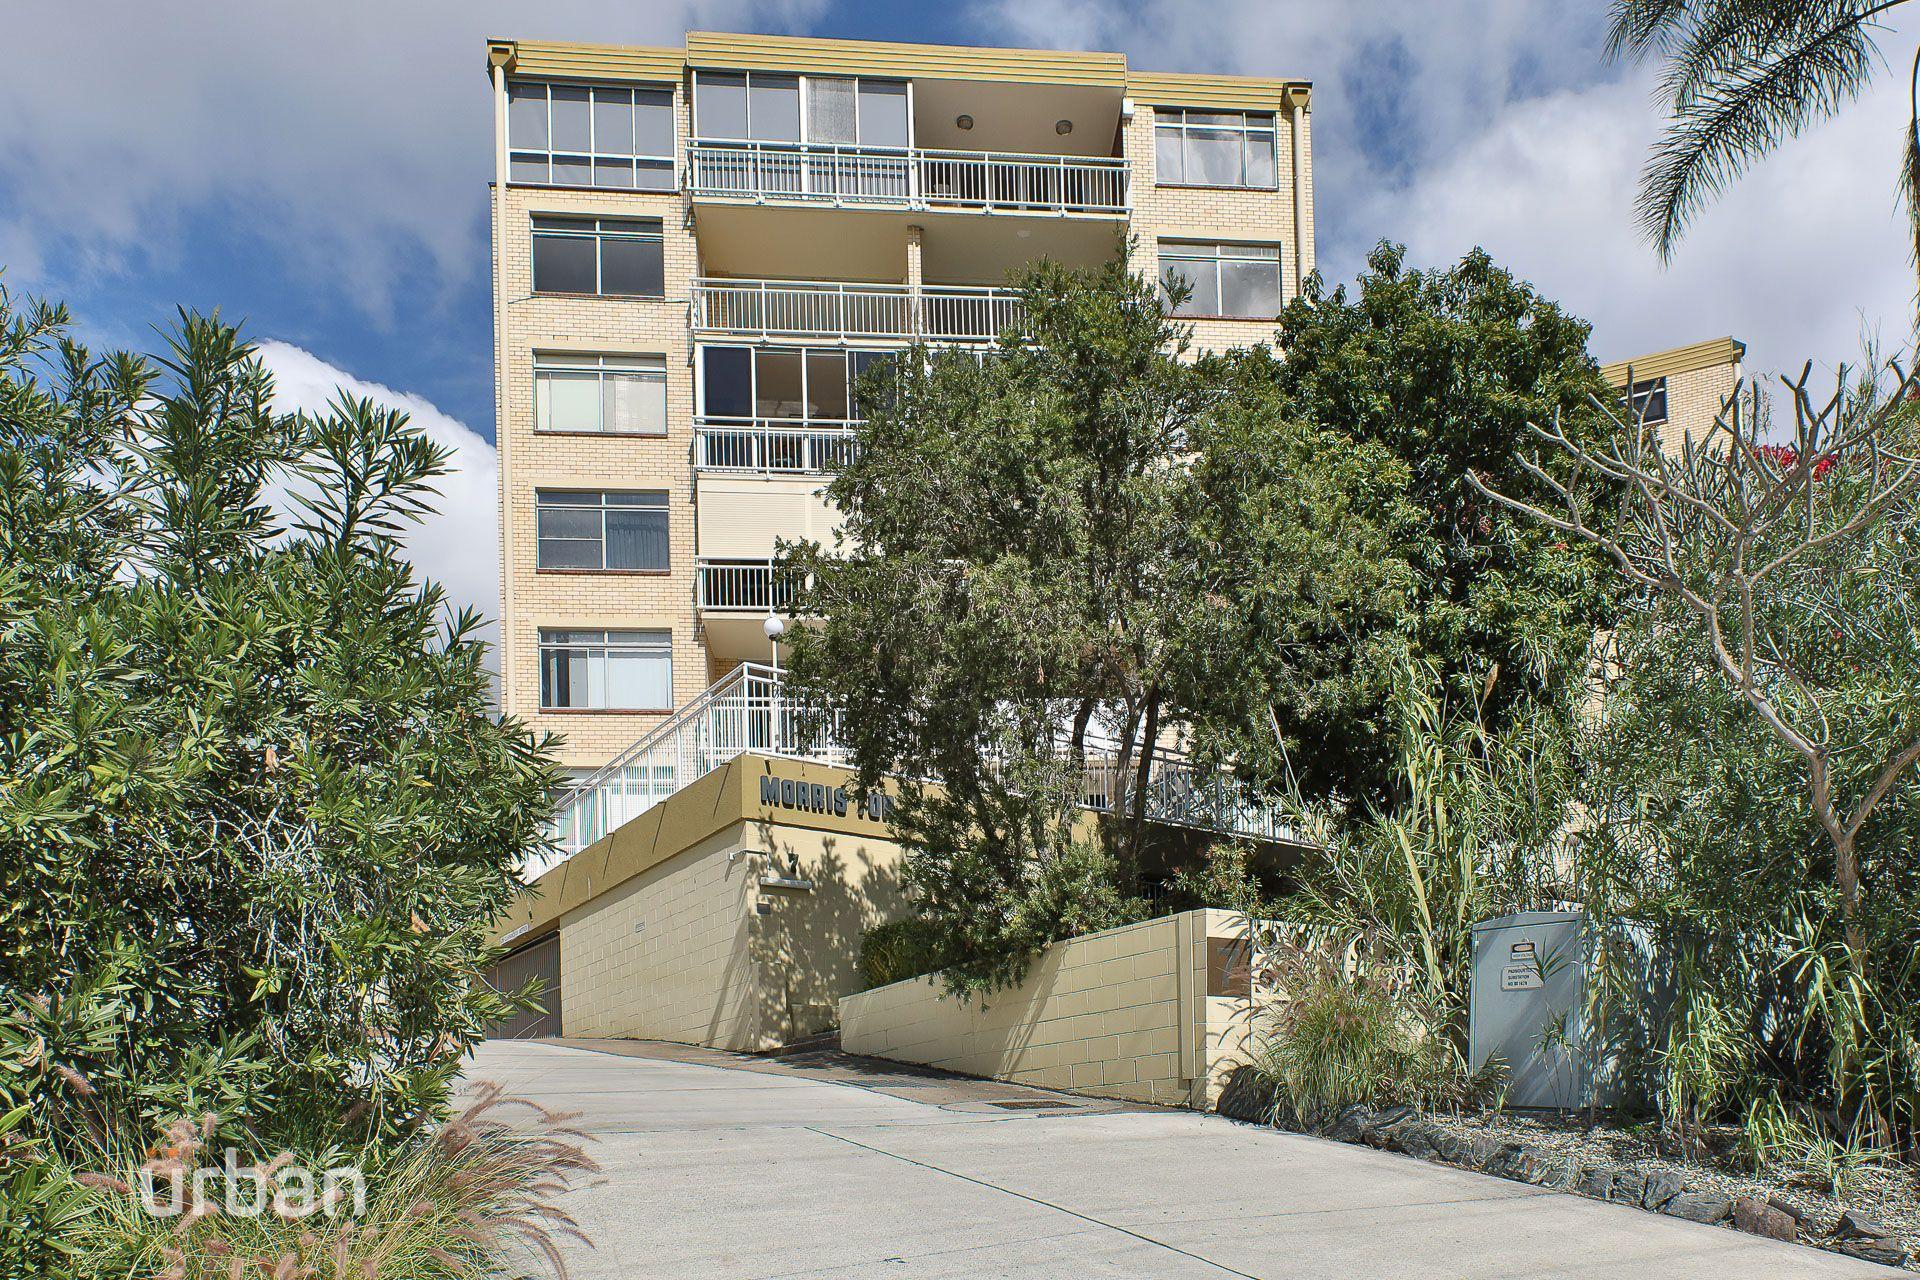 19/7 Prospect Terrace Kelvin Grove 4059